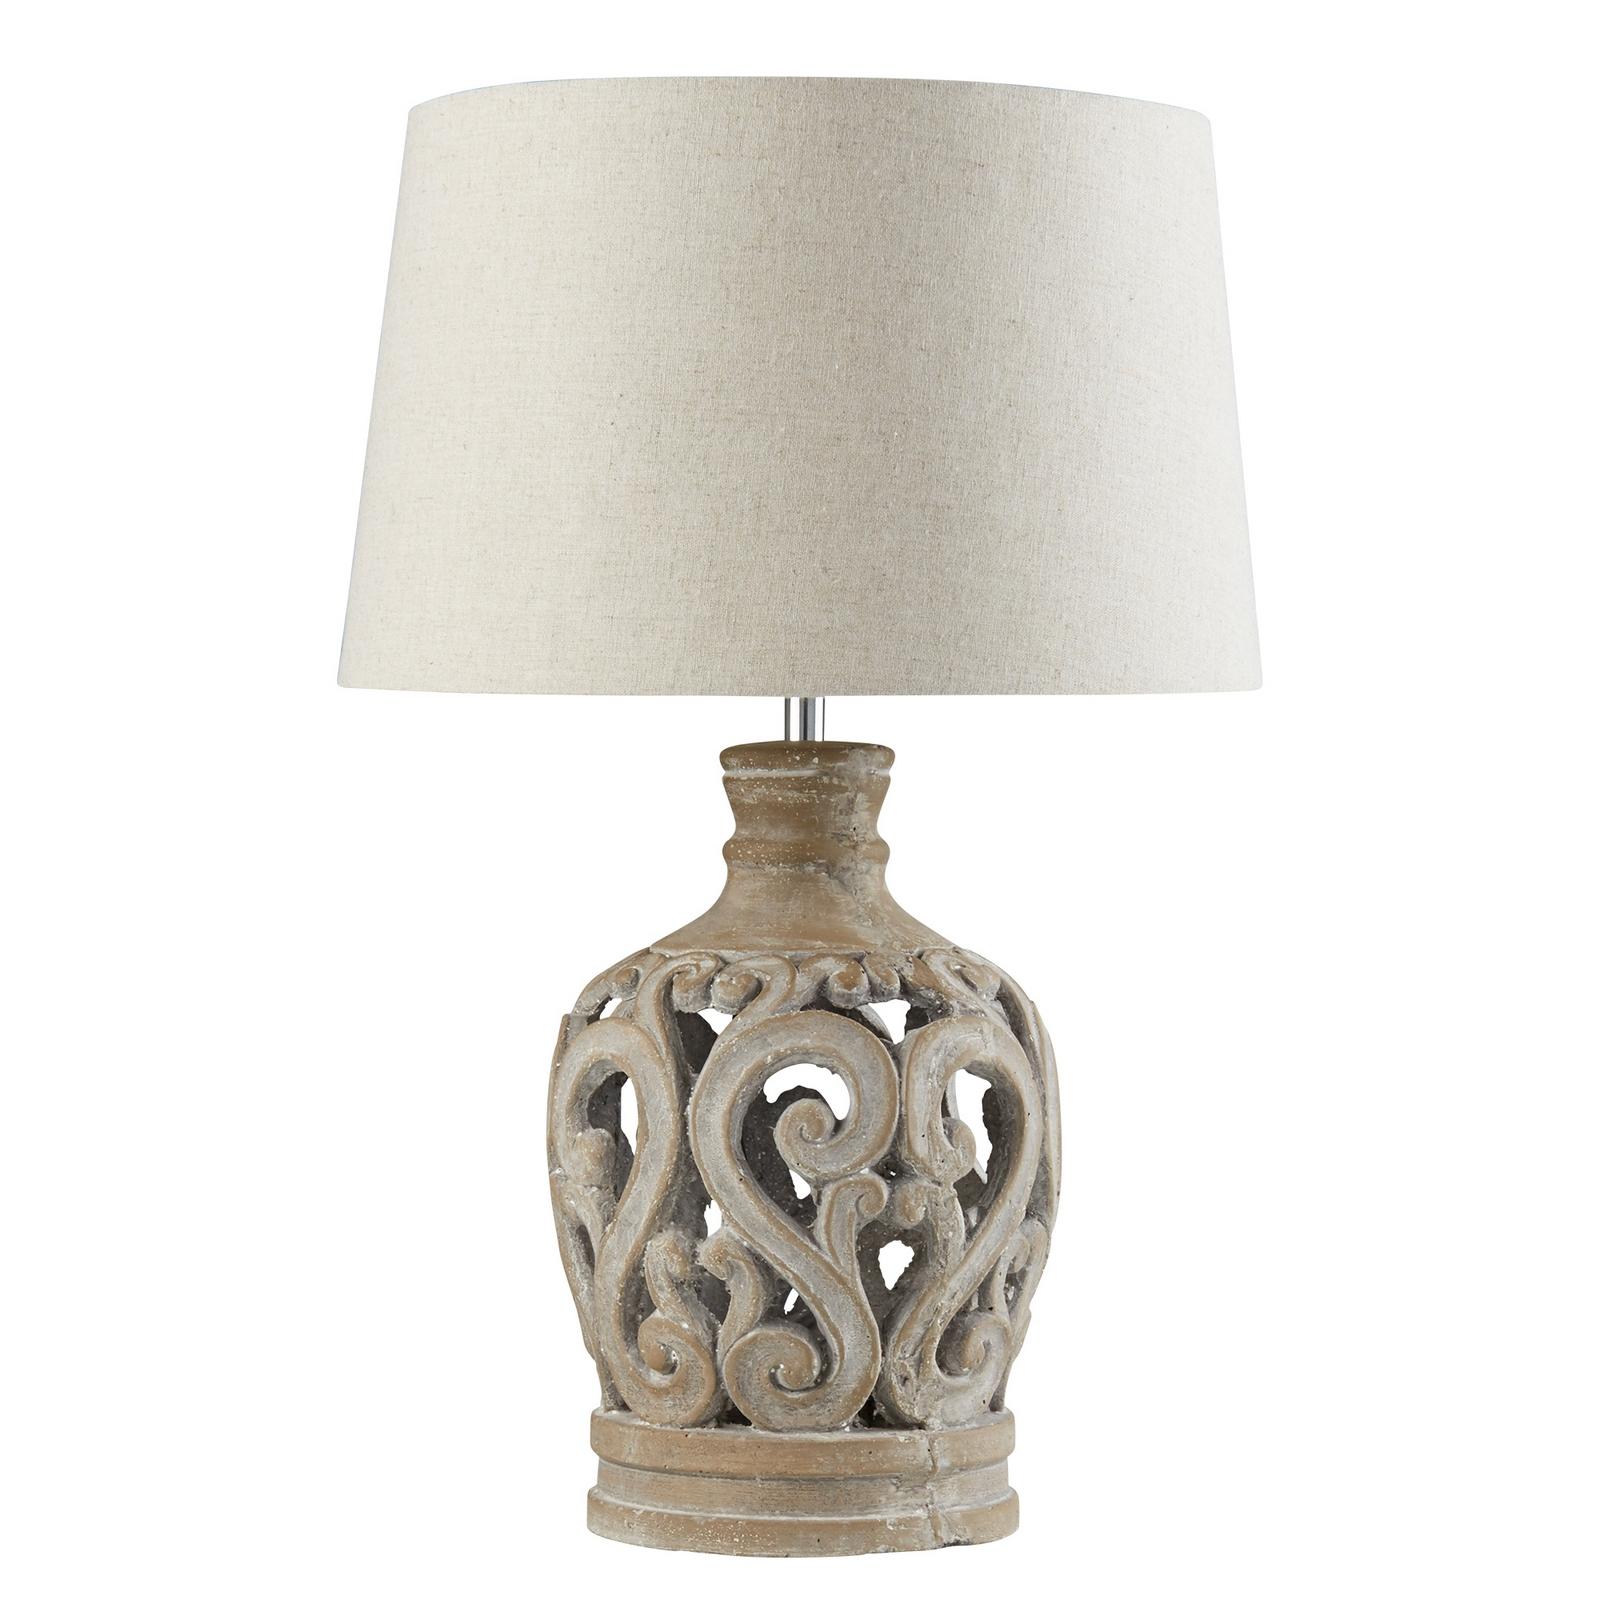 TABLE LAMP - STONE BASE